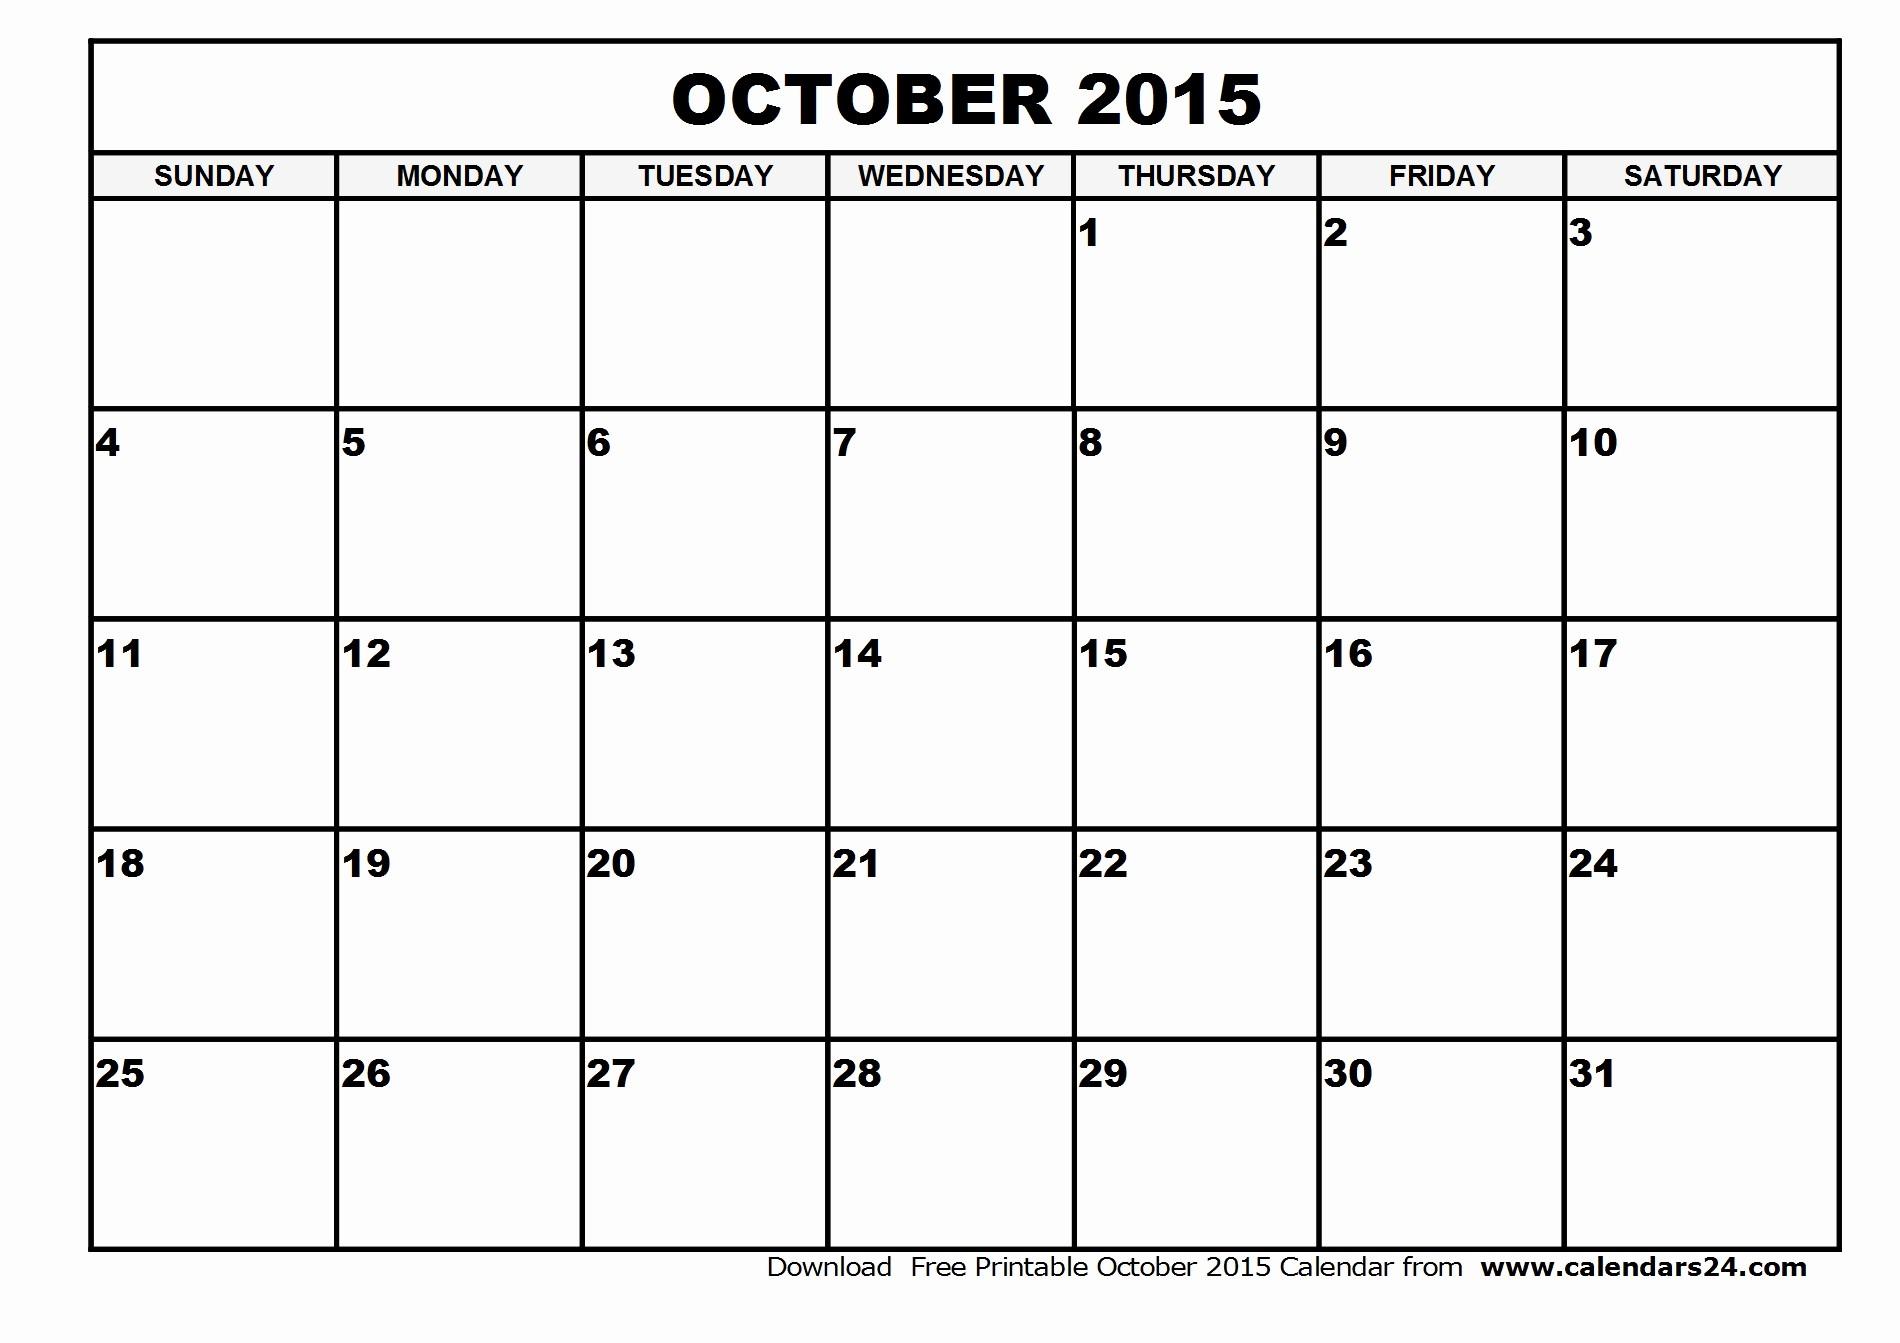 Free Calendar Templates August 2015 Awesome October 2015 Calendar Free Imgok